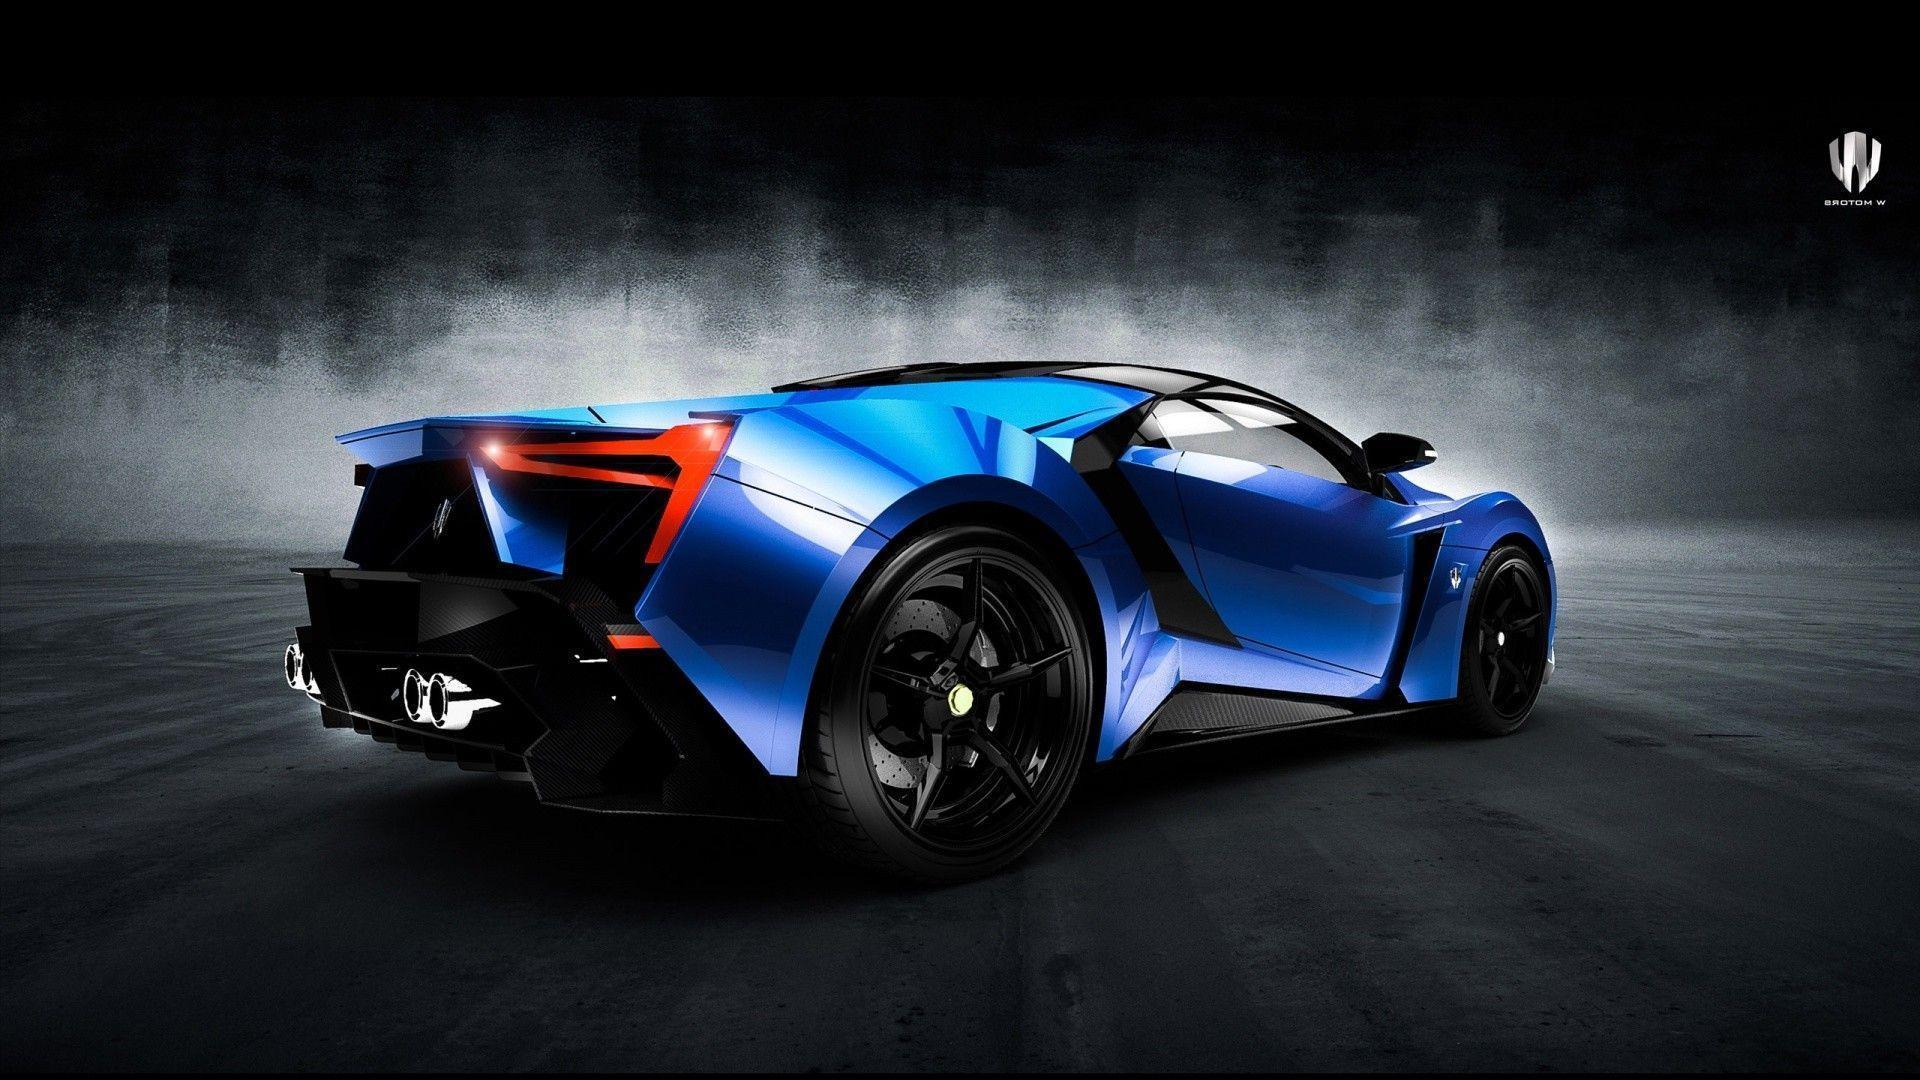 Blue Bugatti Veyron Wallpapers Top Free Blue Bugatti Veyron Backgrounds Wallpaperaccess